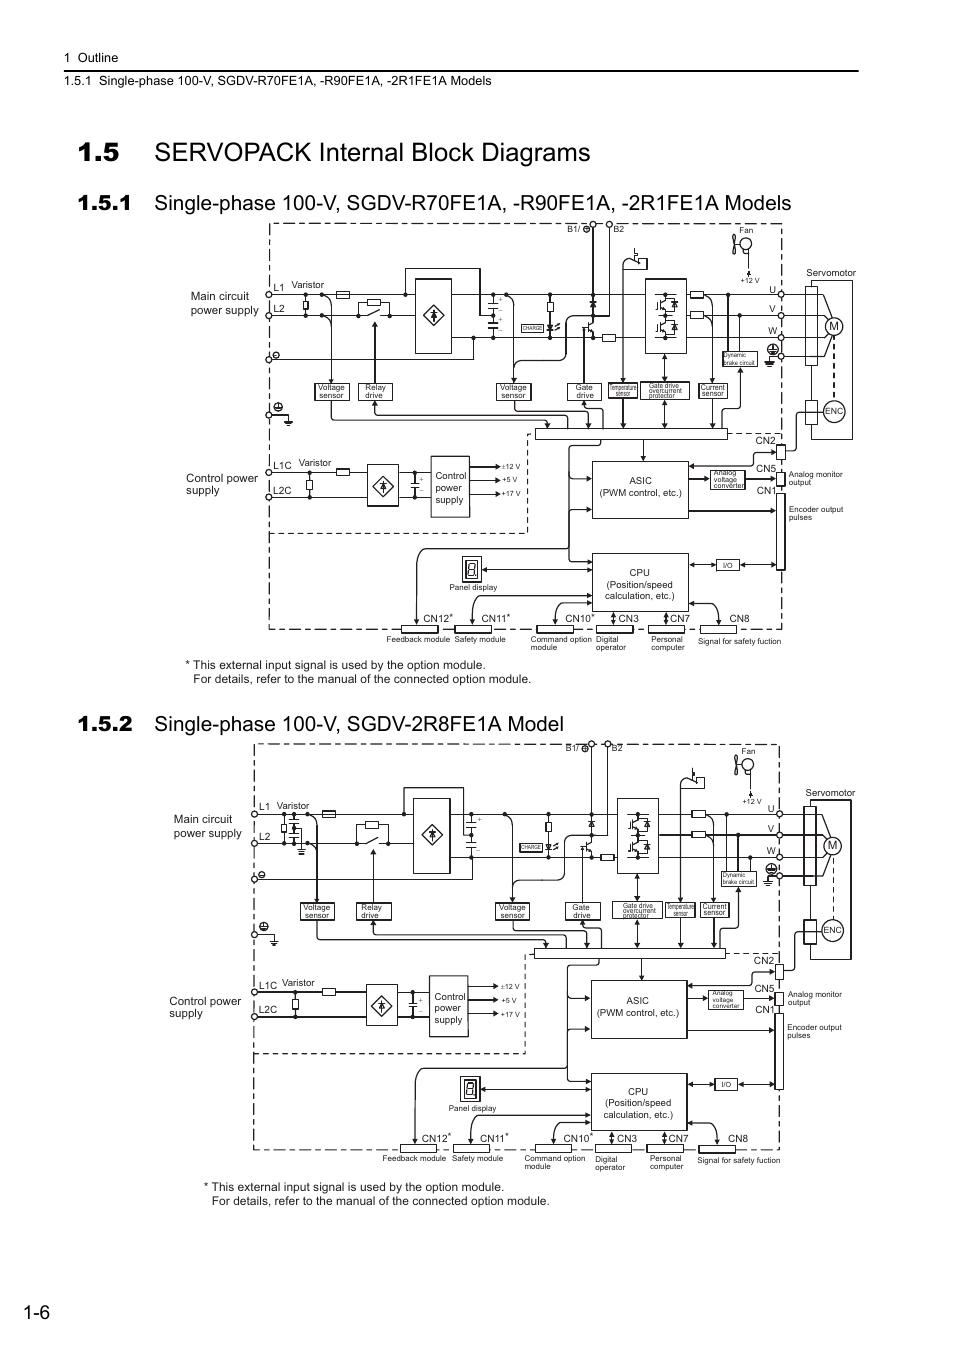 5 Servopack Internal Block Diagrams  2 Single